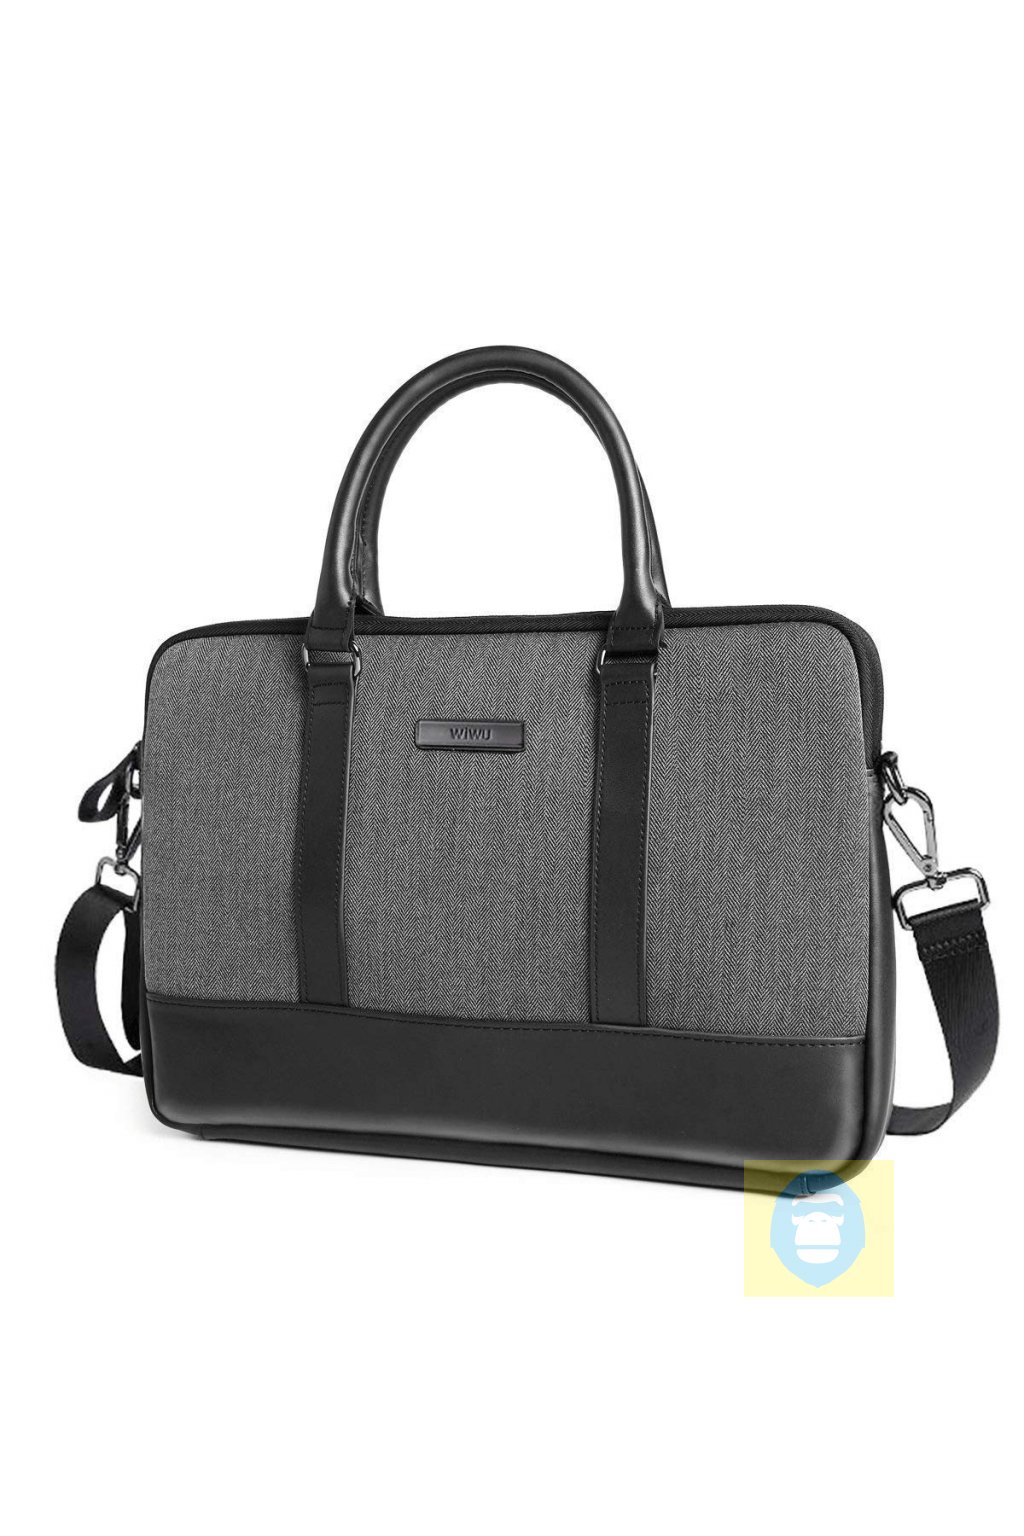 "WiWU London Briefcase Taška na notebook 15,6"""